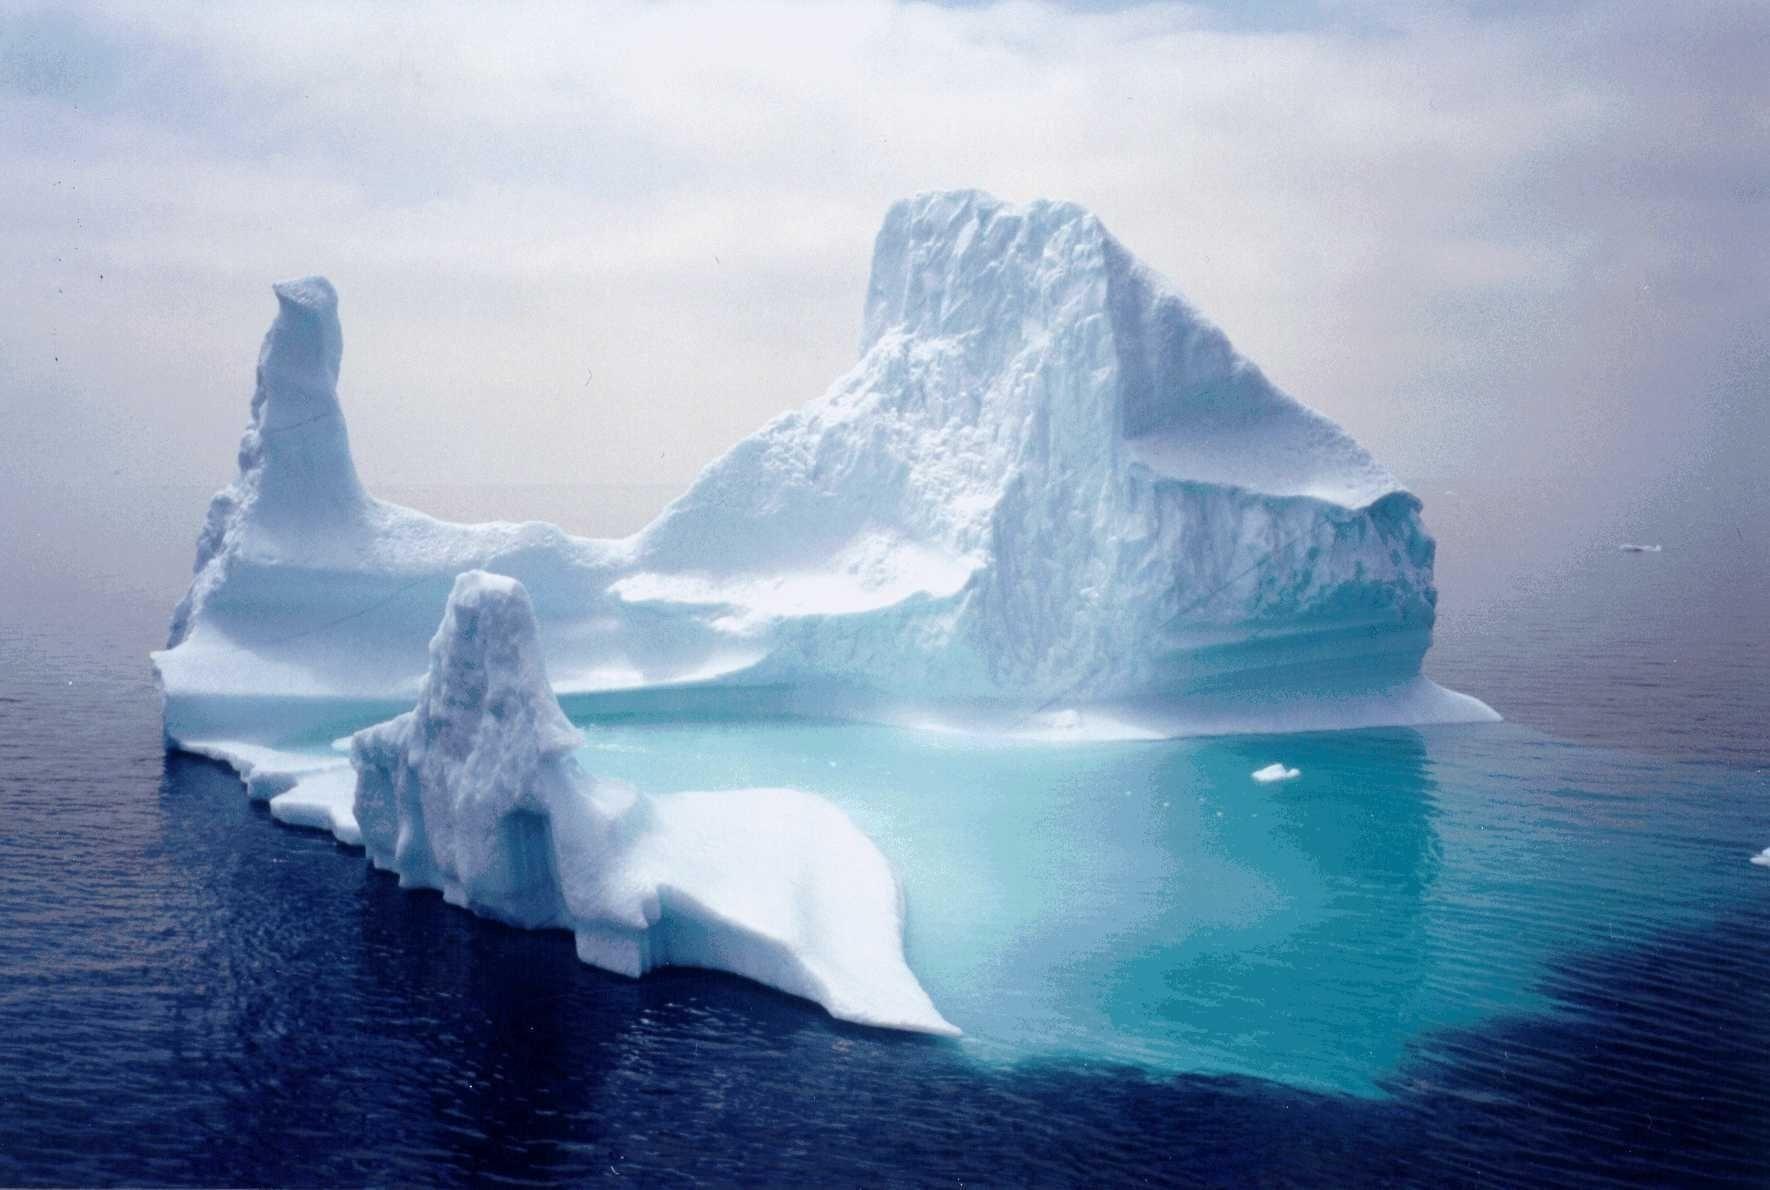 Iceberg Backgrounds on Wallpapers Vista